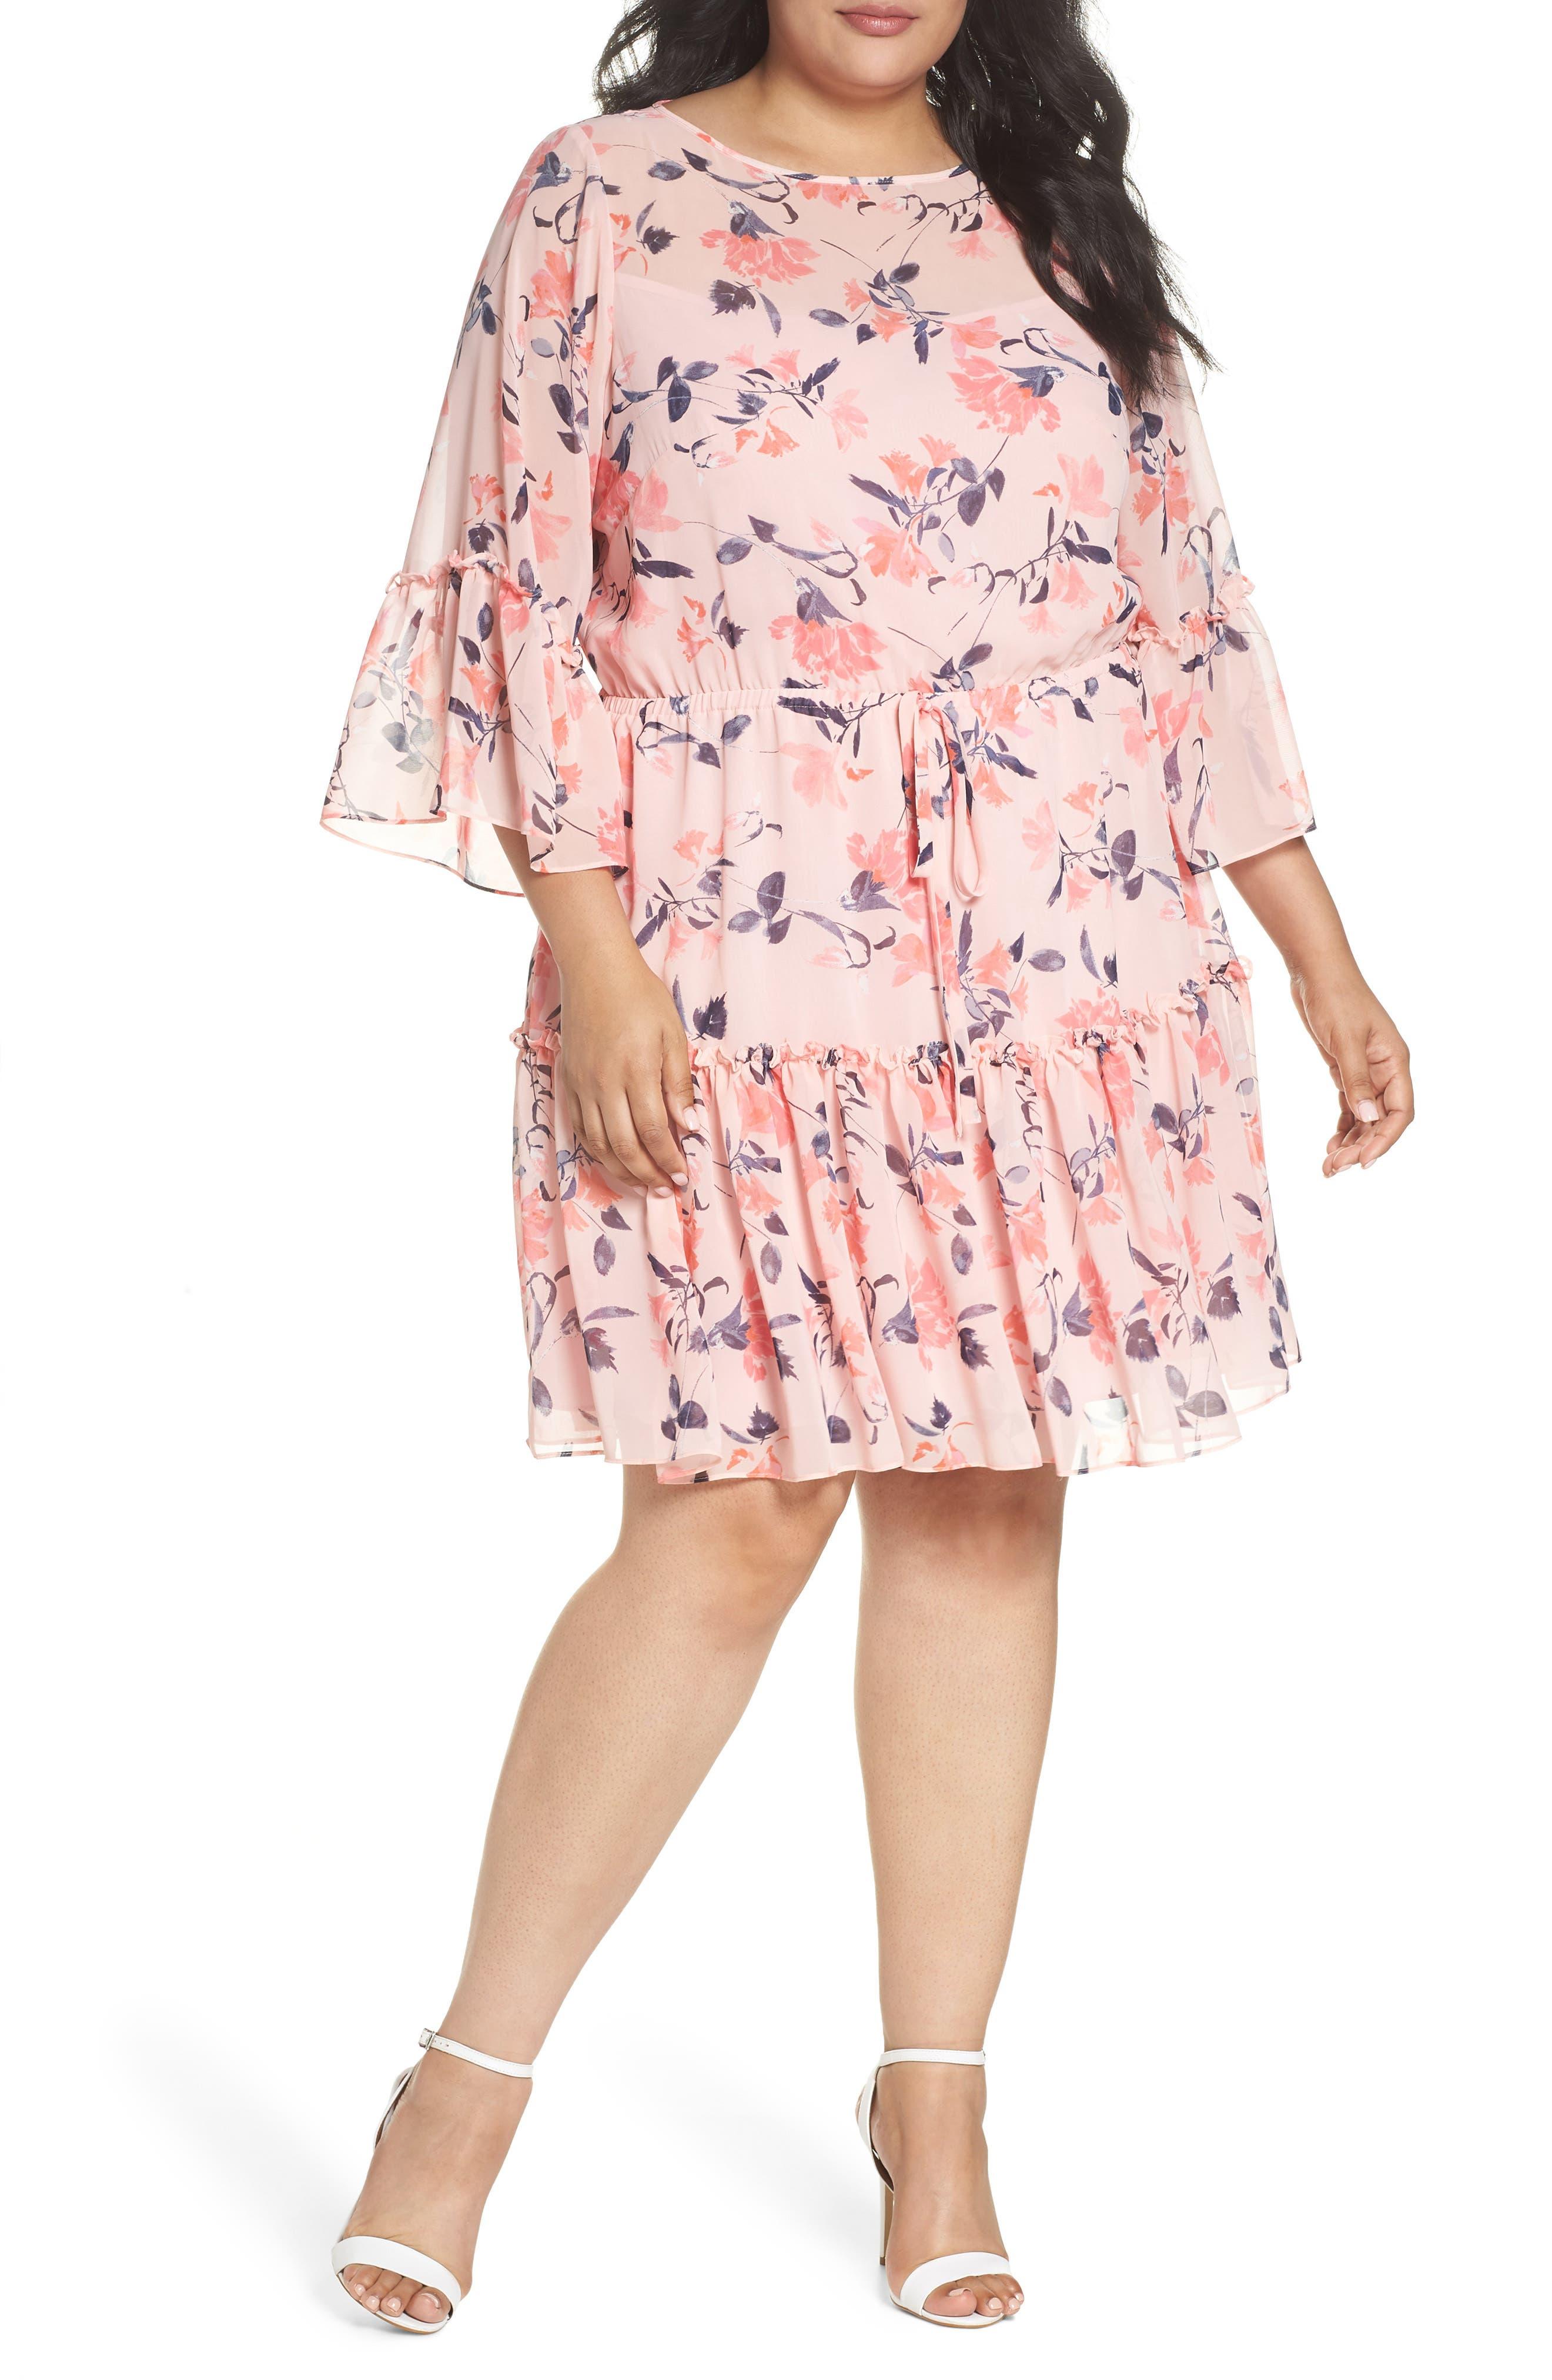 Elza J Floral Bell Sleeve Chiffon Dress,                             Main thumbnail 1, color,                             684